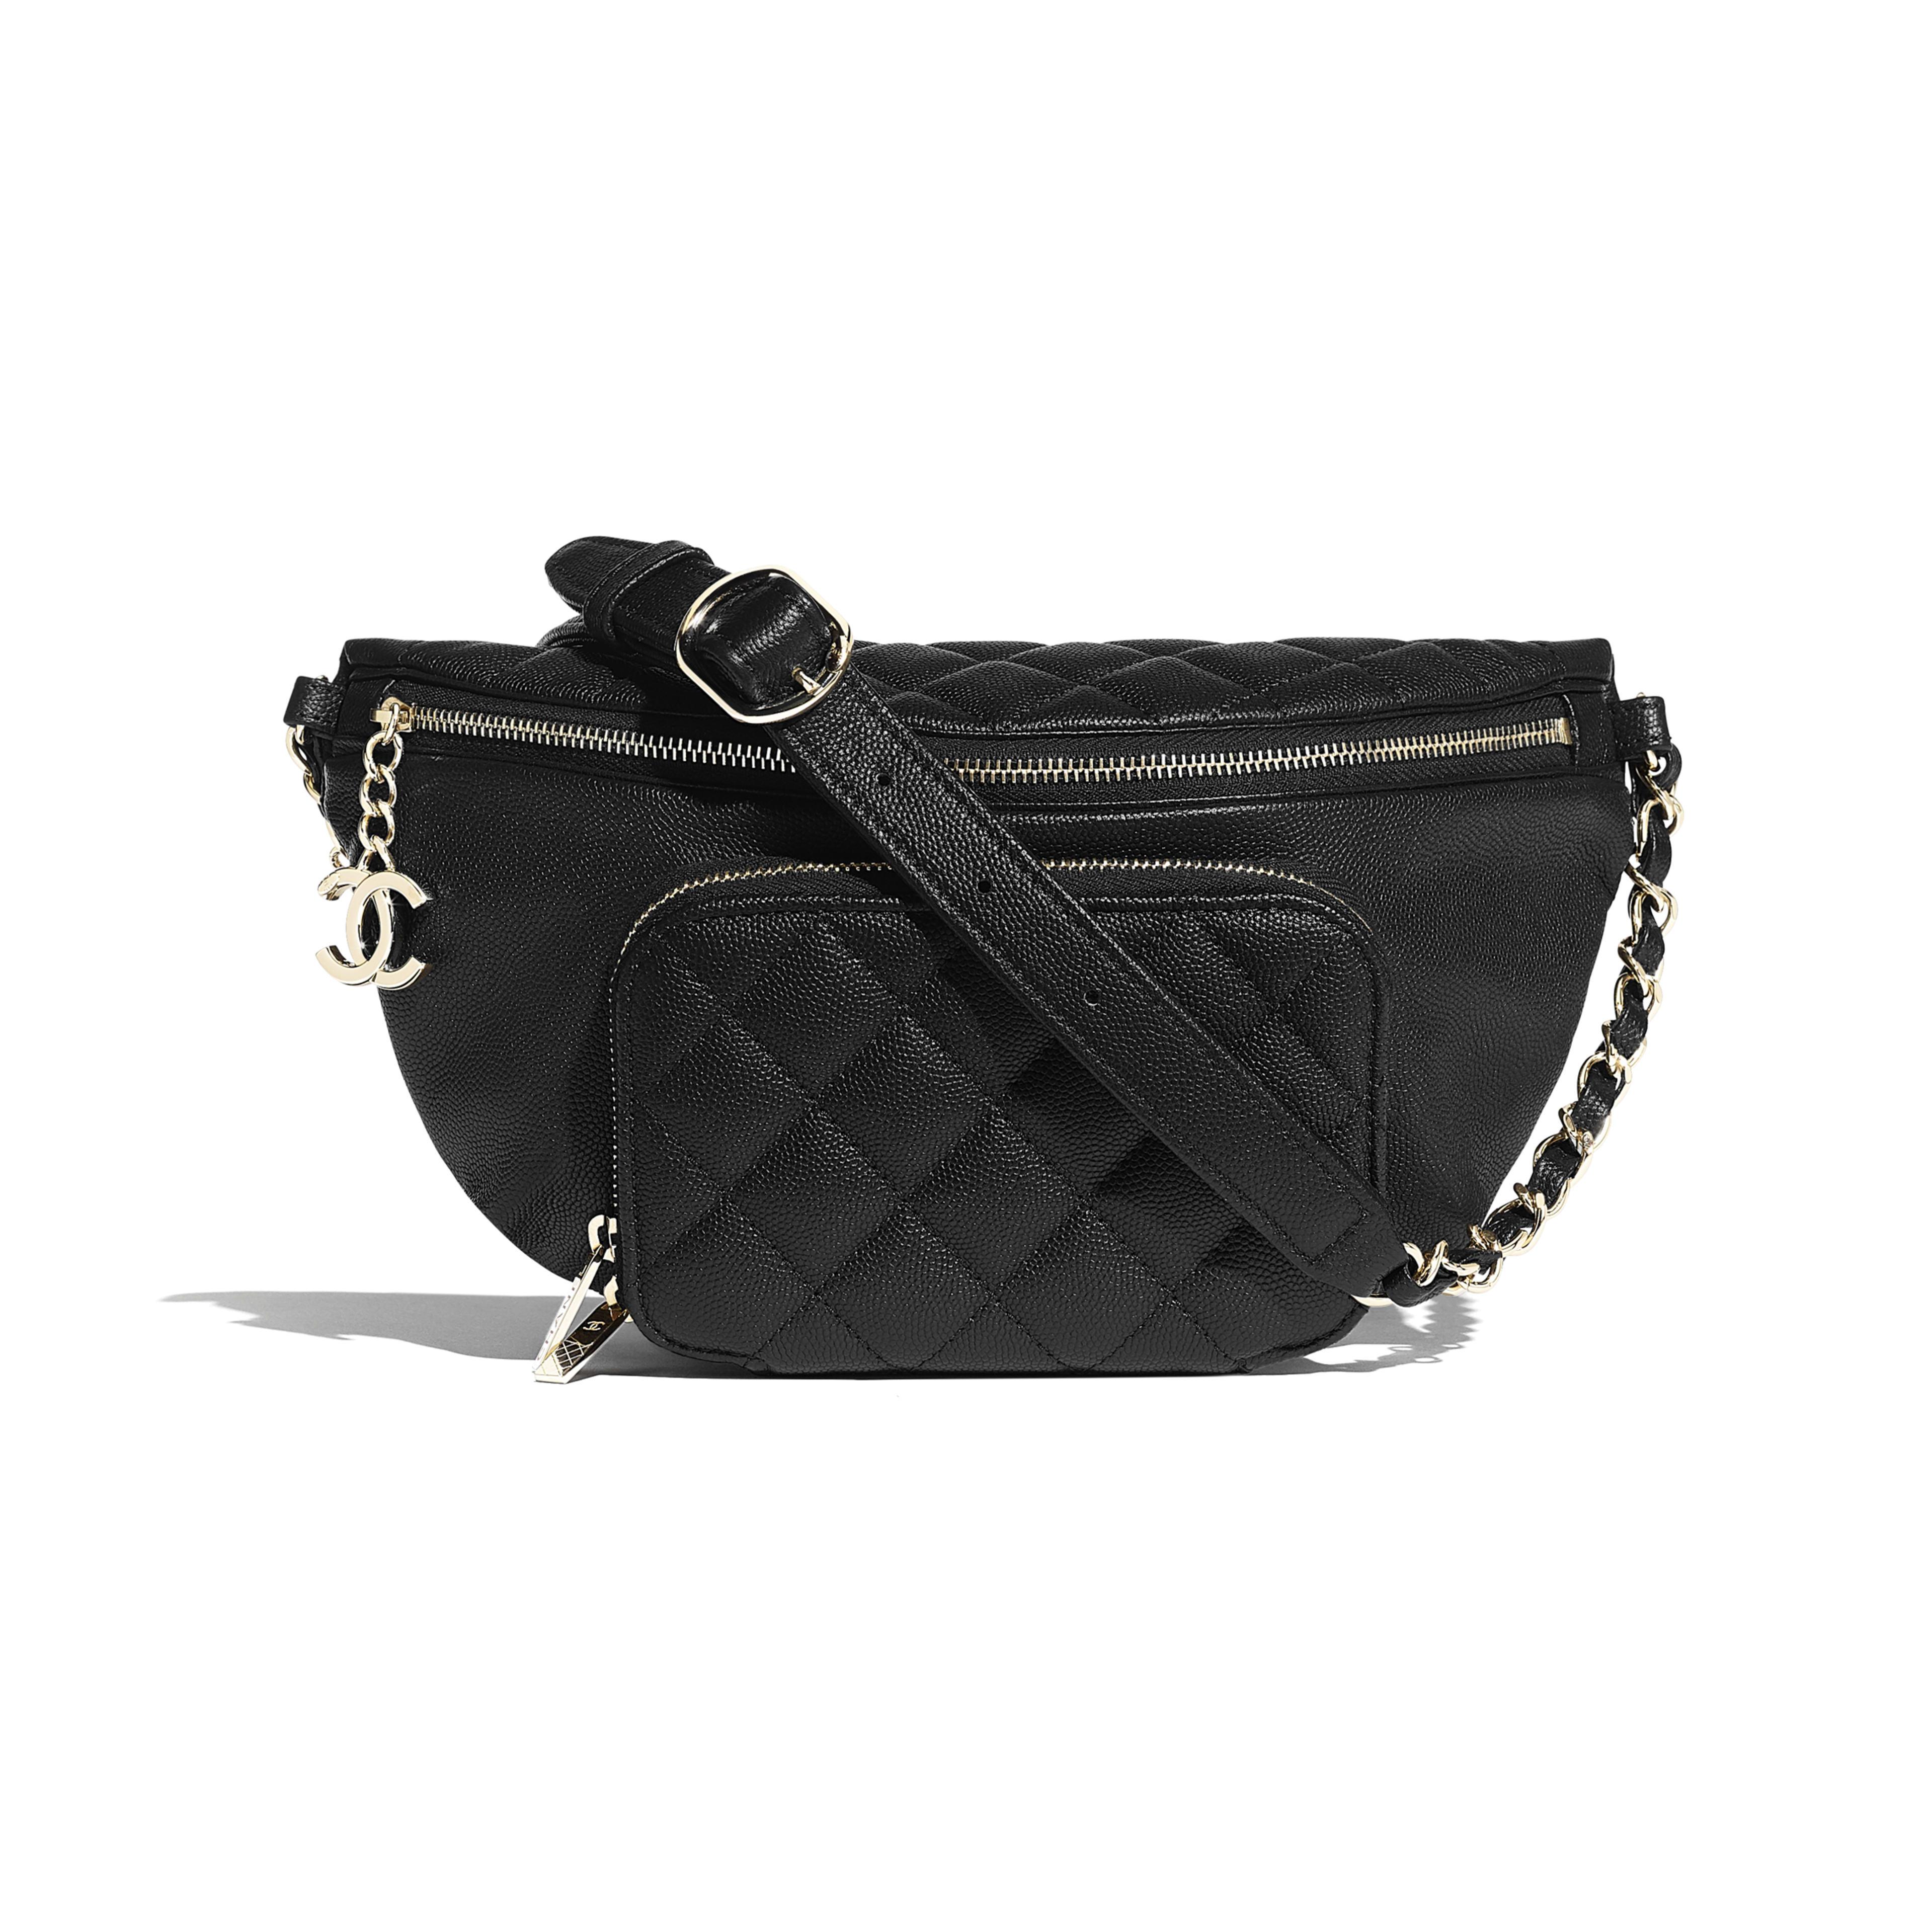 b021f3fdbd Waist Bag - Black - Grained Calfskin   Gold-Tone Metal - Default view ...